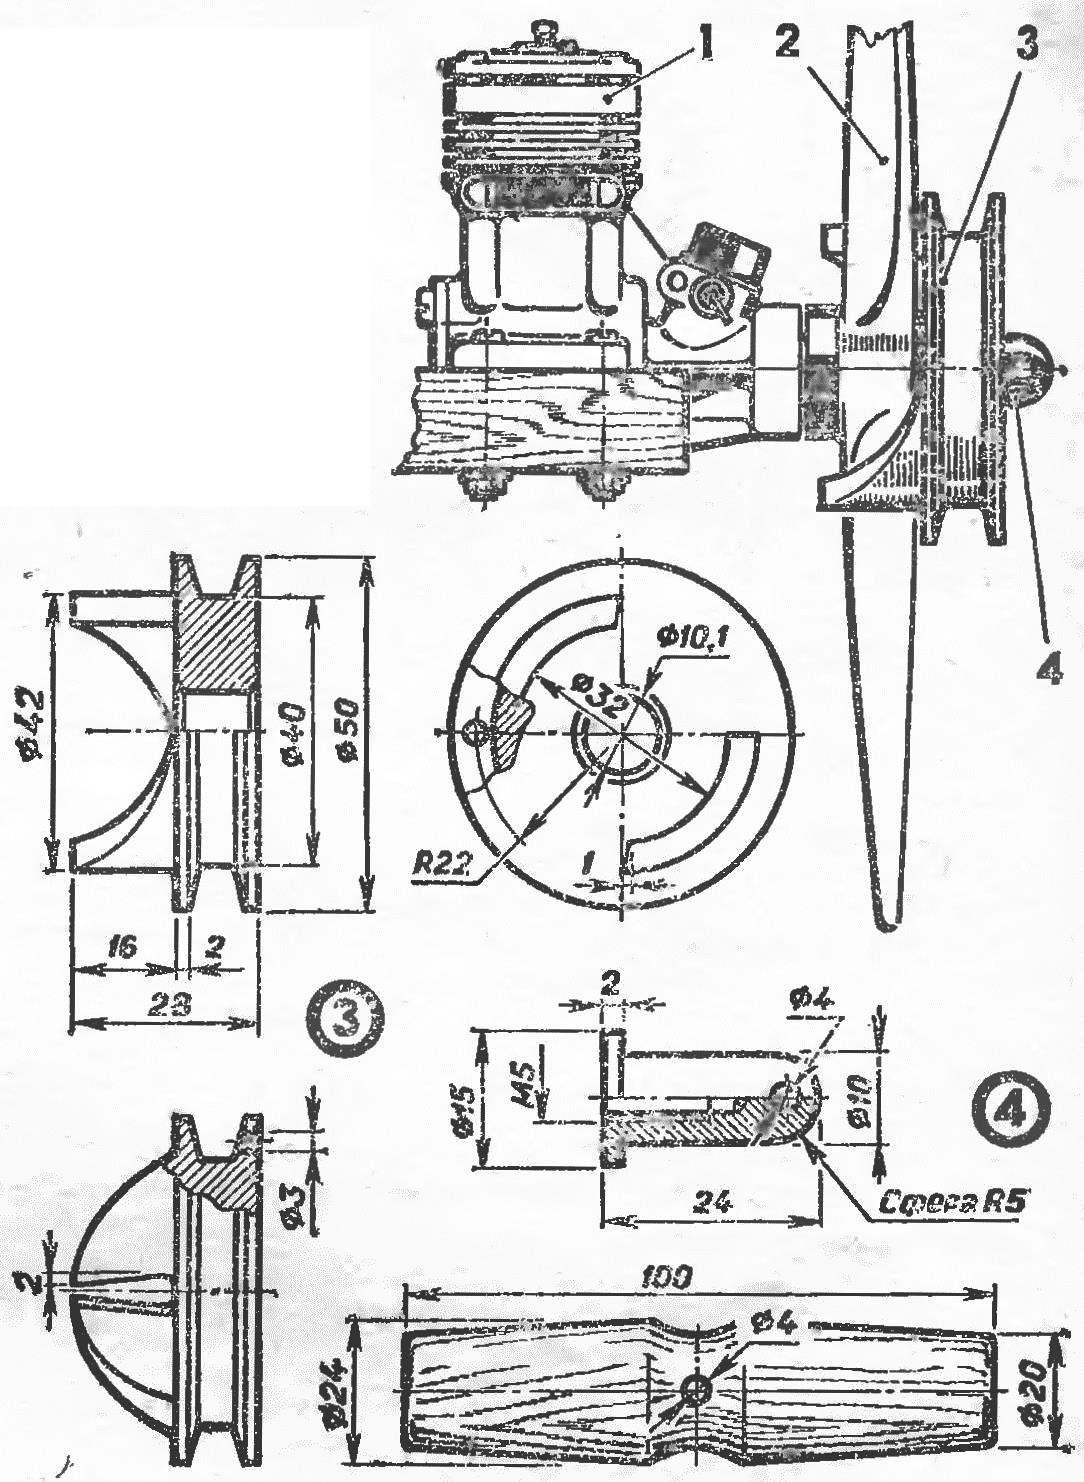 Установка стартер ного устройства на микродвигателе